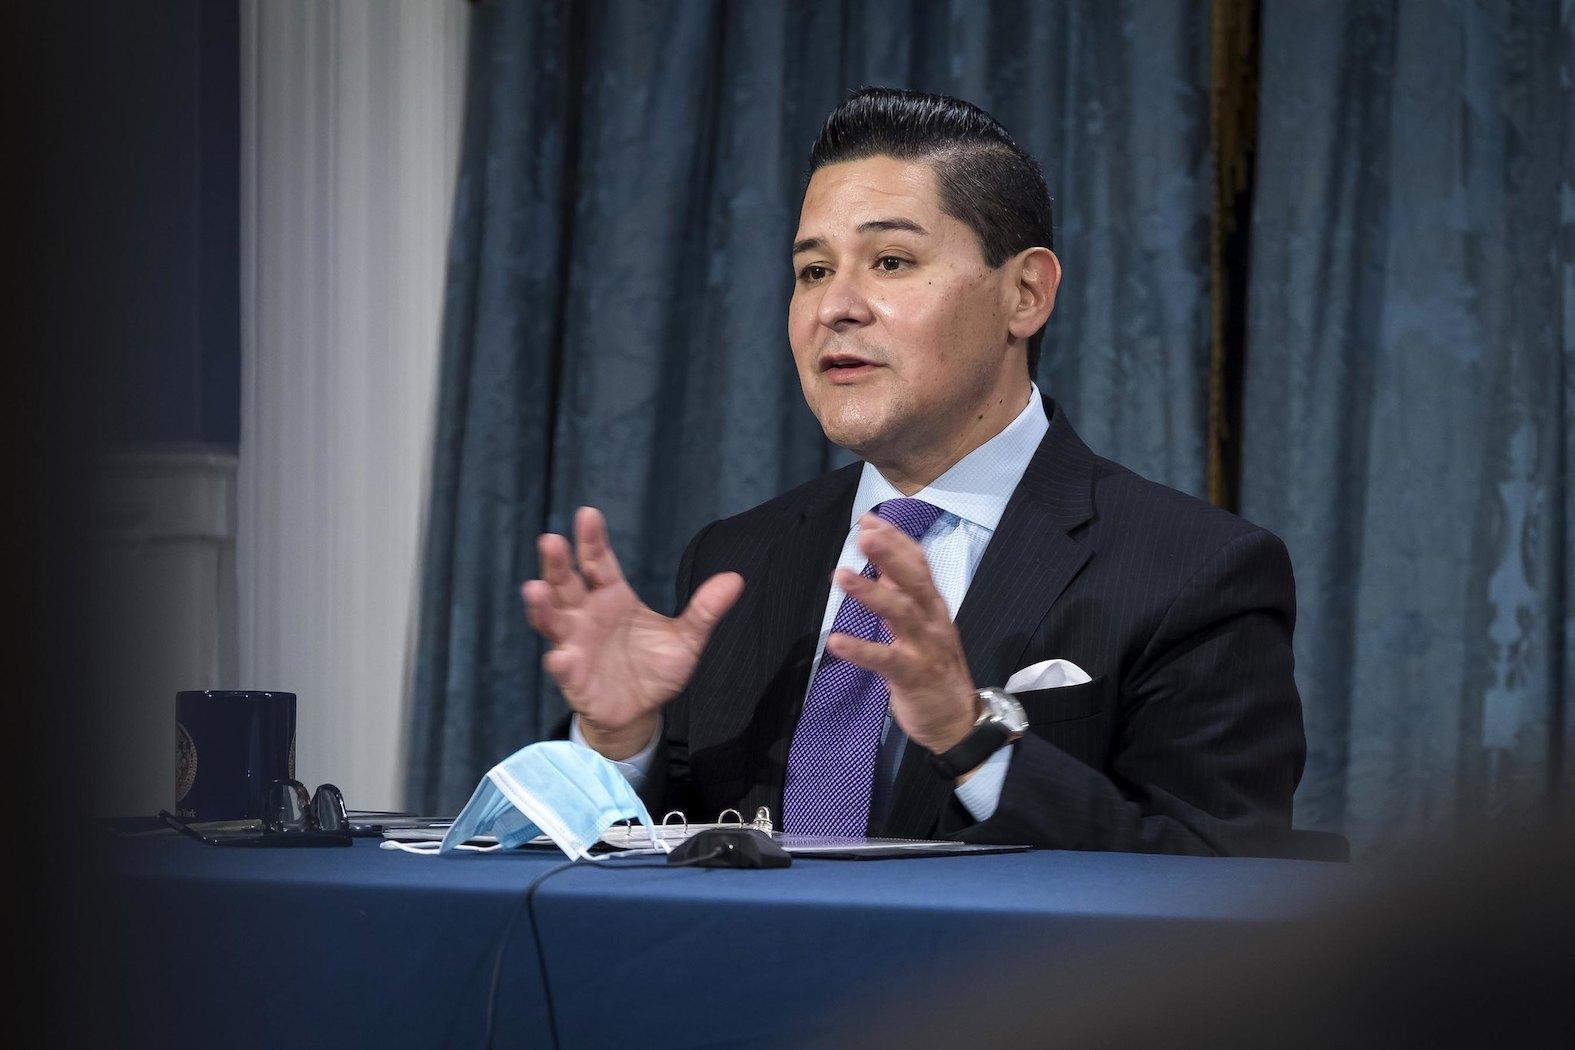 Schools Chancellor Richard Carranza at De Blasio's media availability on November 18th.